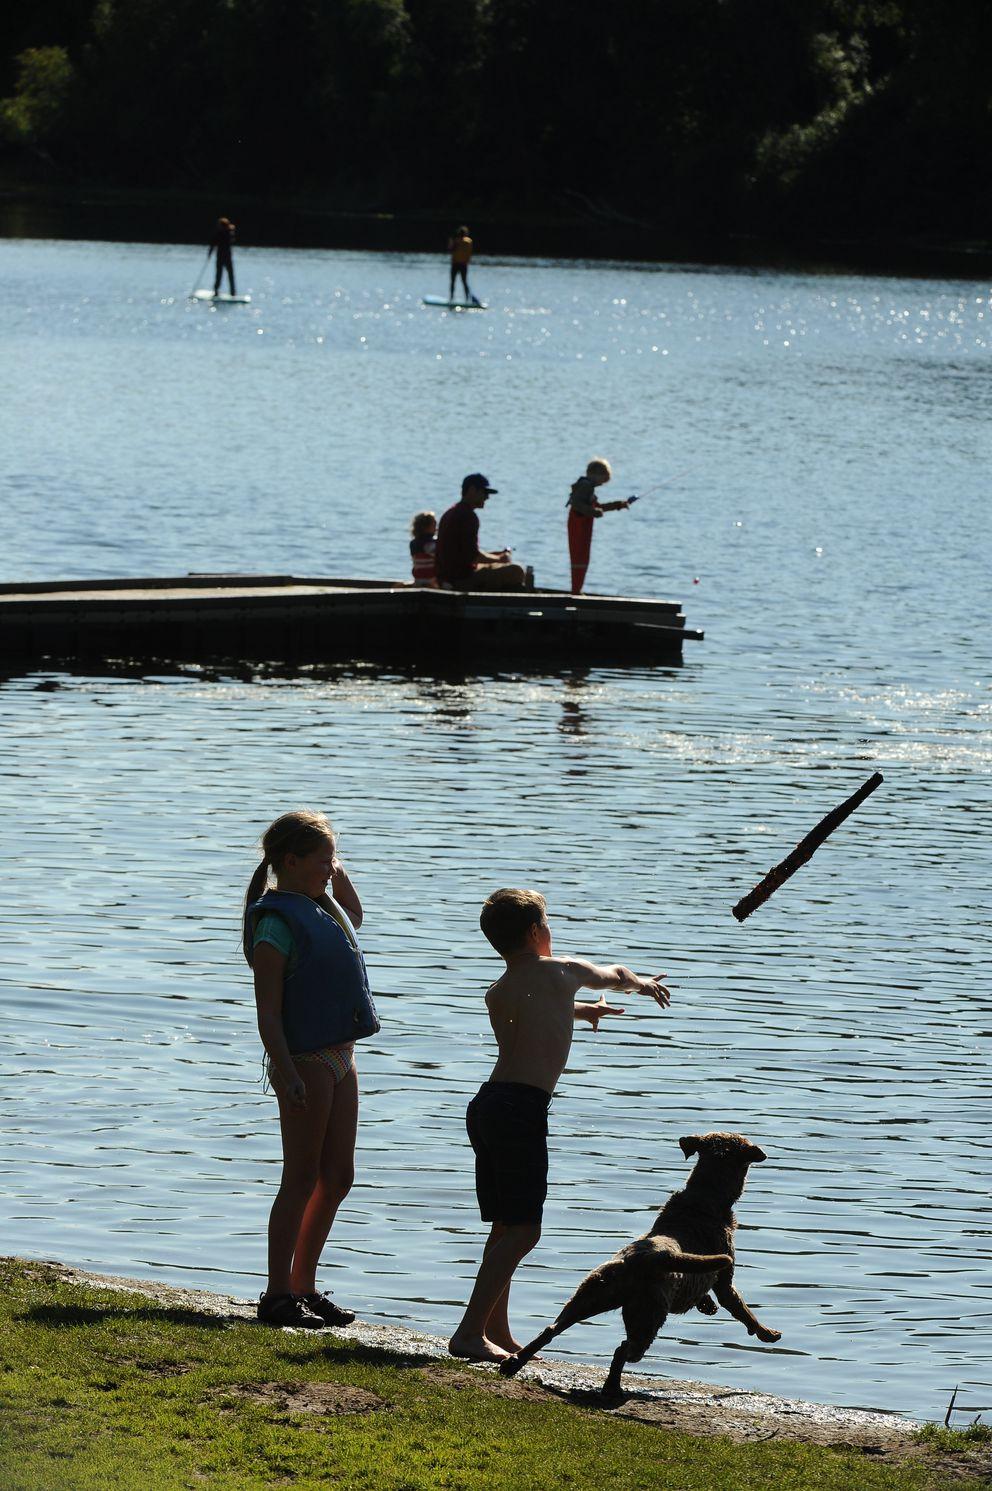 Avery Steadman looks on as her brother, Soren Steadman, throws a stick for Jorgie at Little Campbell Lake. (Bob Hallinen / ADN)